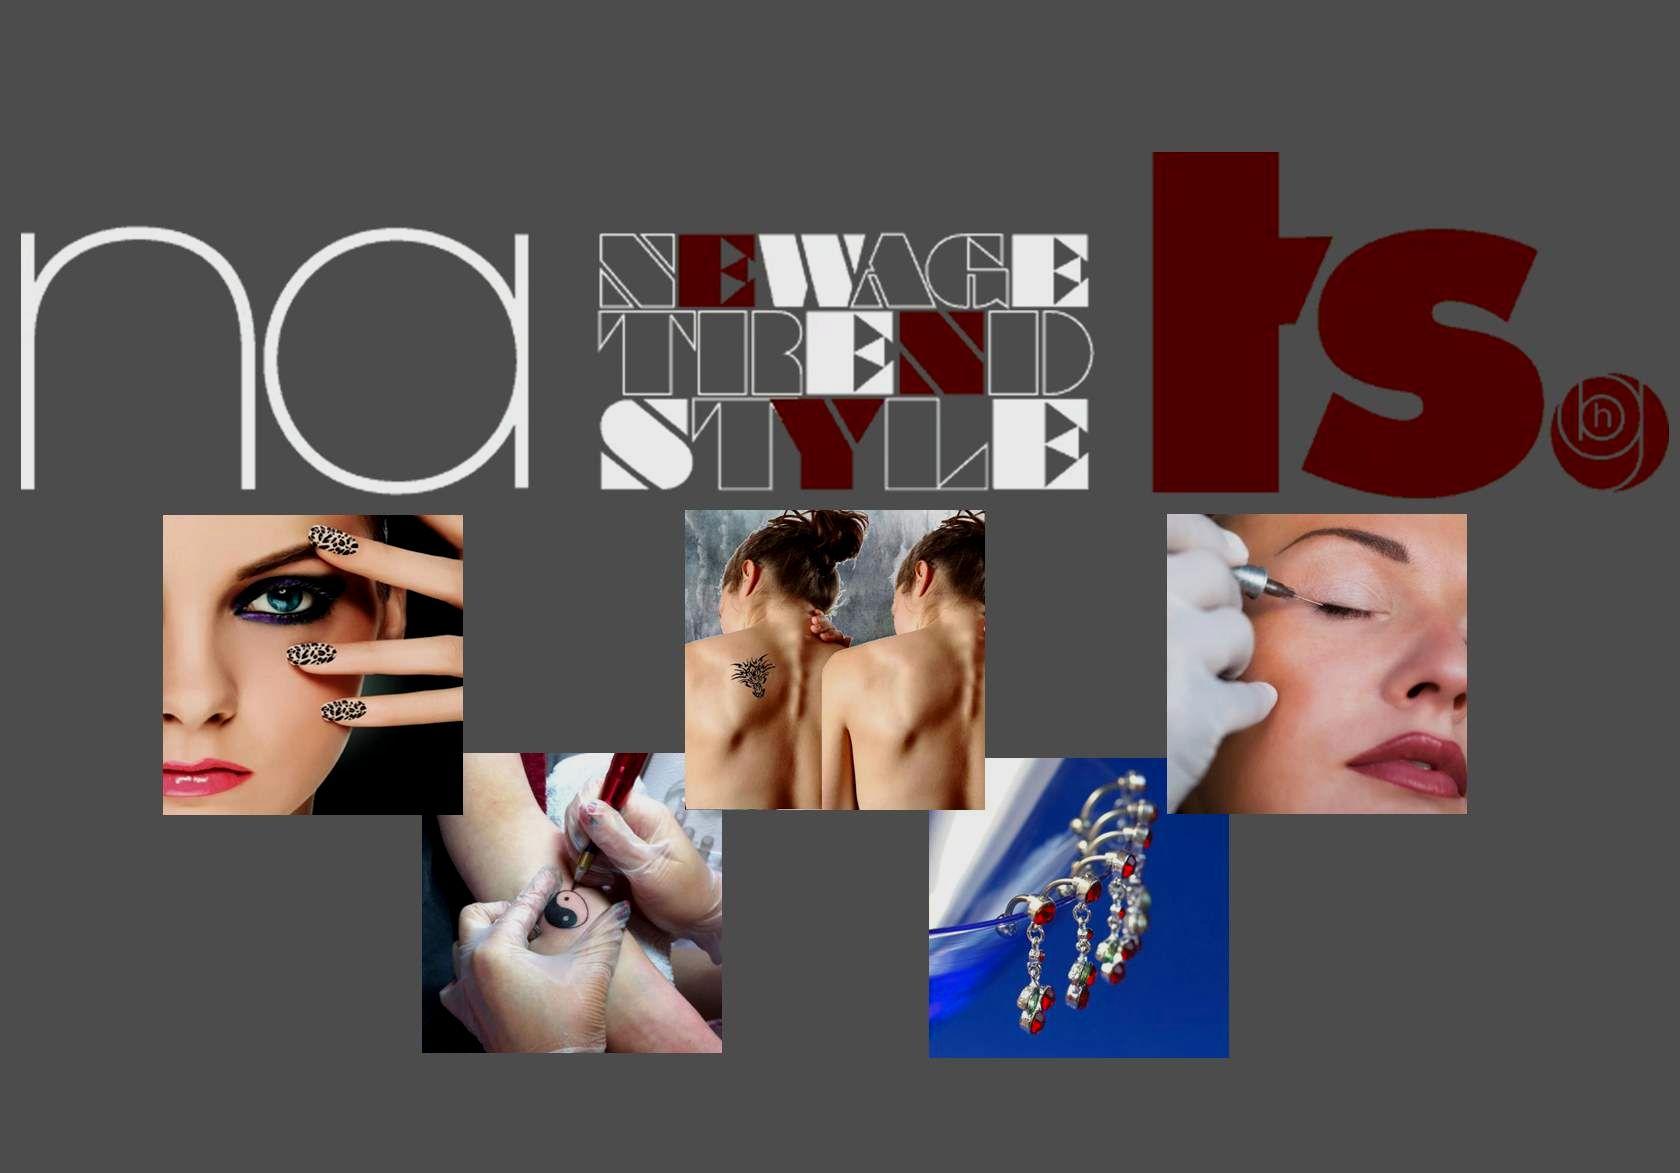 Kosmetikstudio NaTs